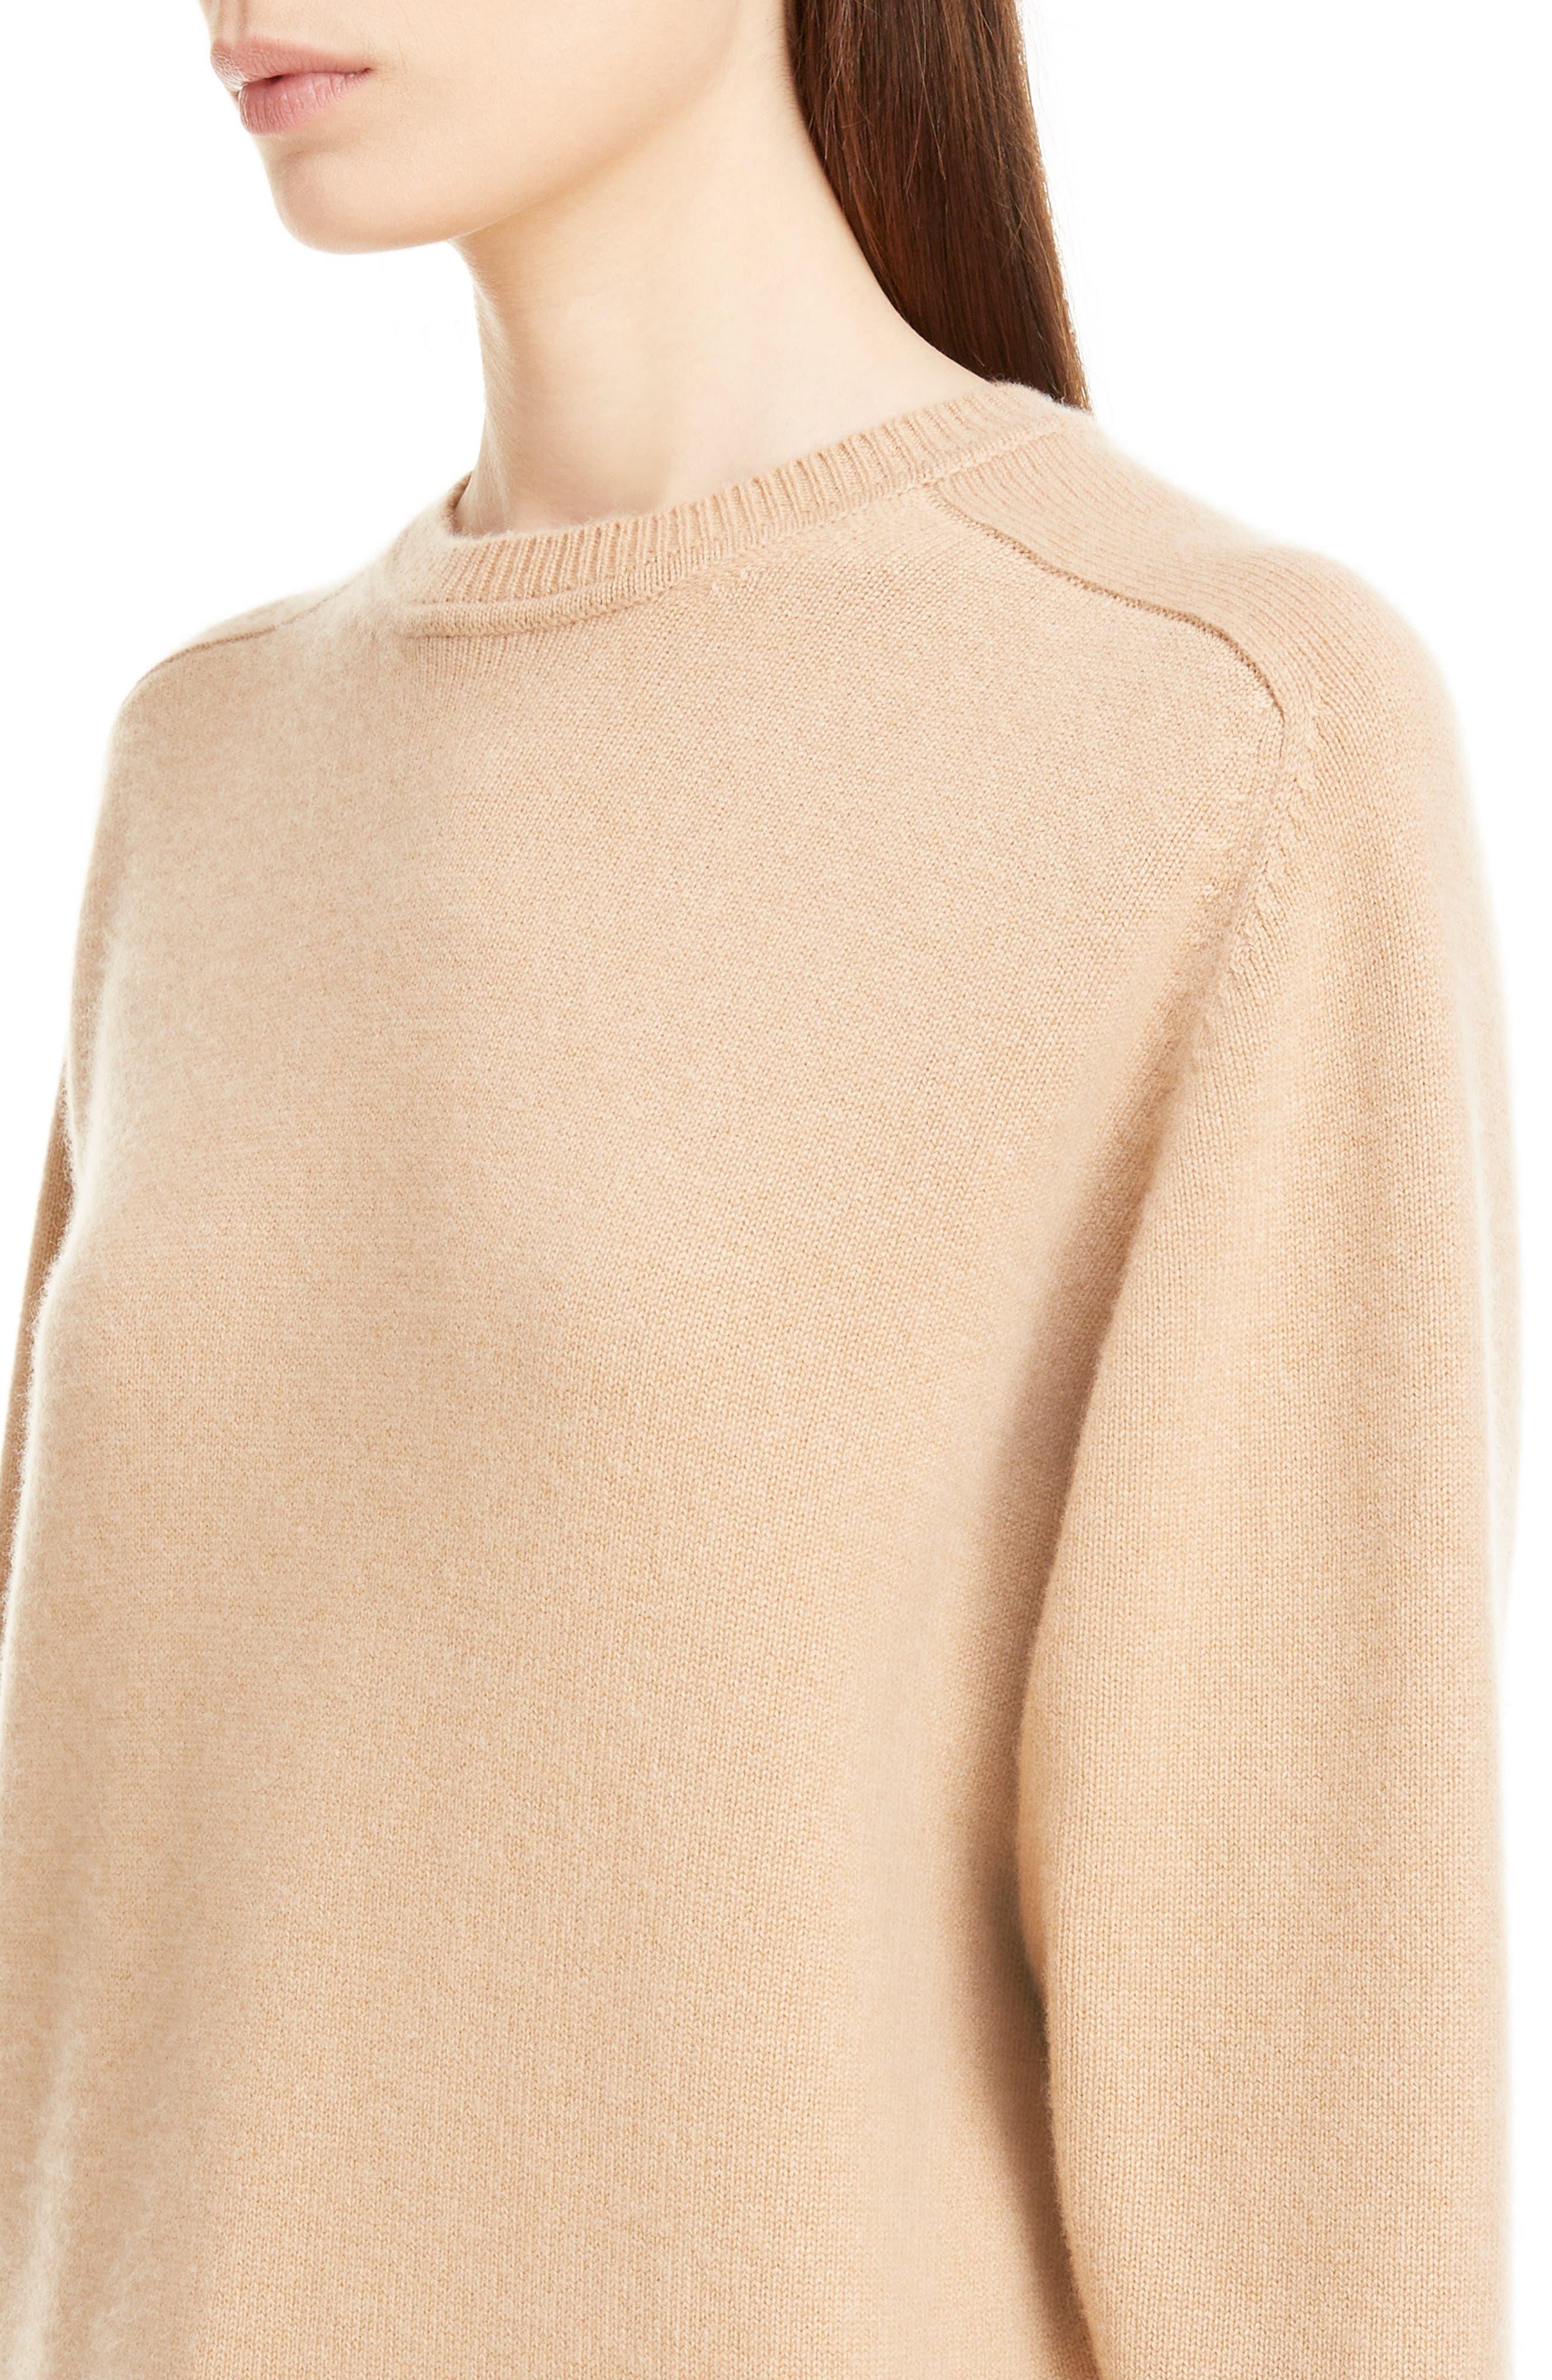 VICTORIA BECKHAM, Cashmere Blend Sweater, Alternate thumbnail 4, color, LIGHT CAMEL